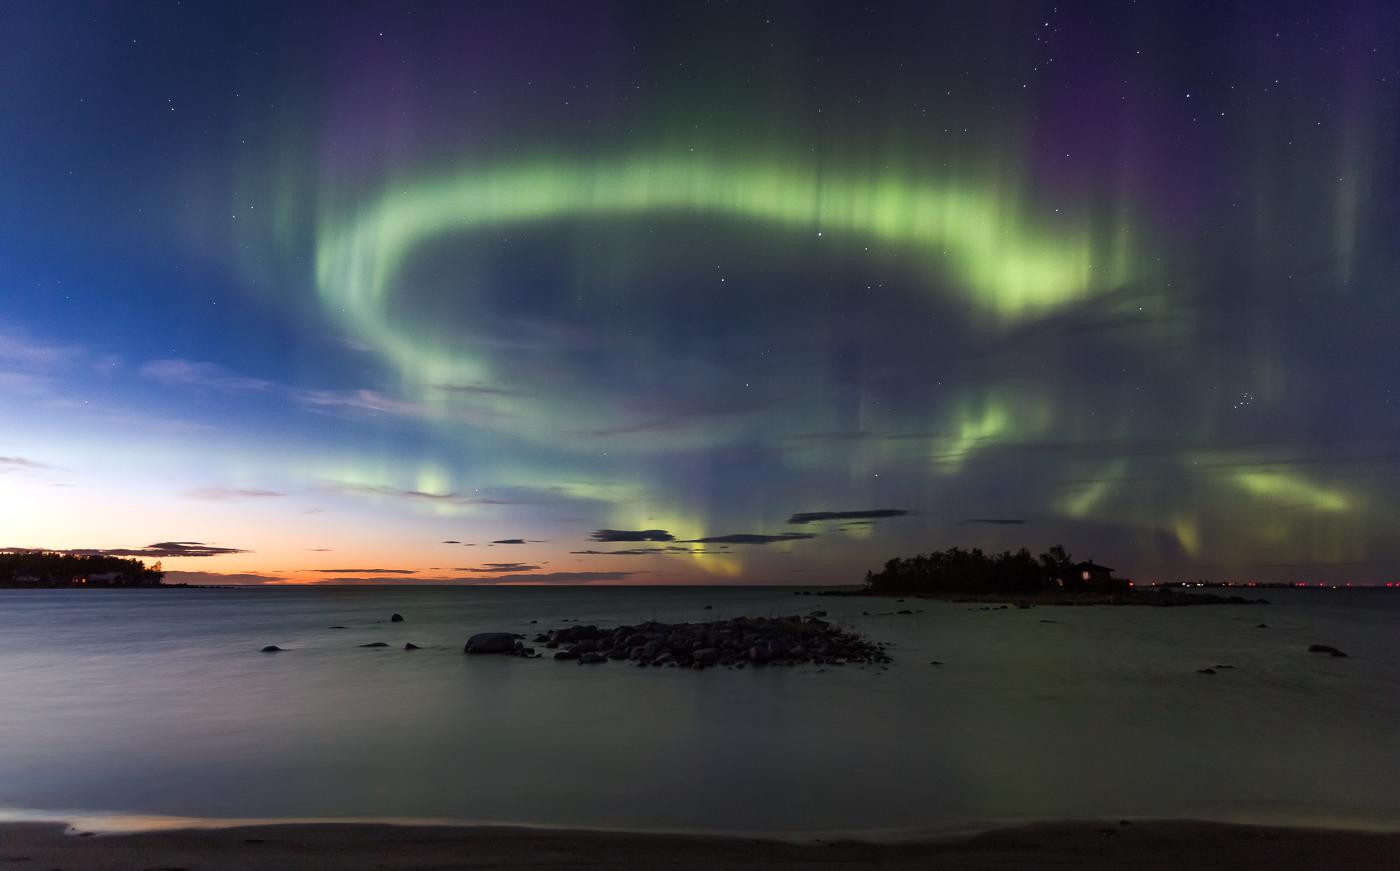 Northern lights over West coast